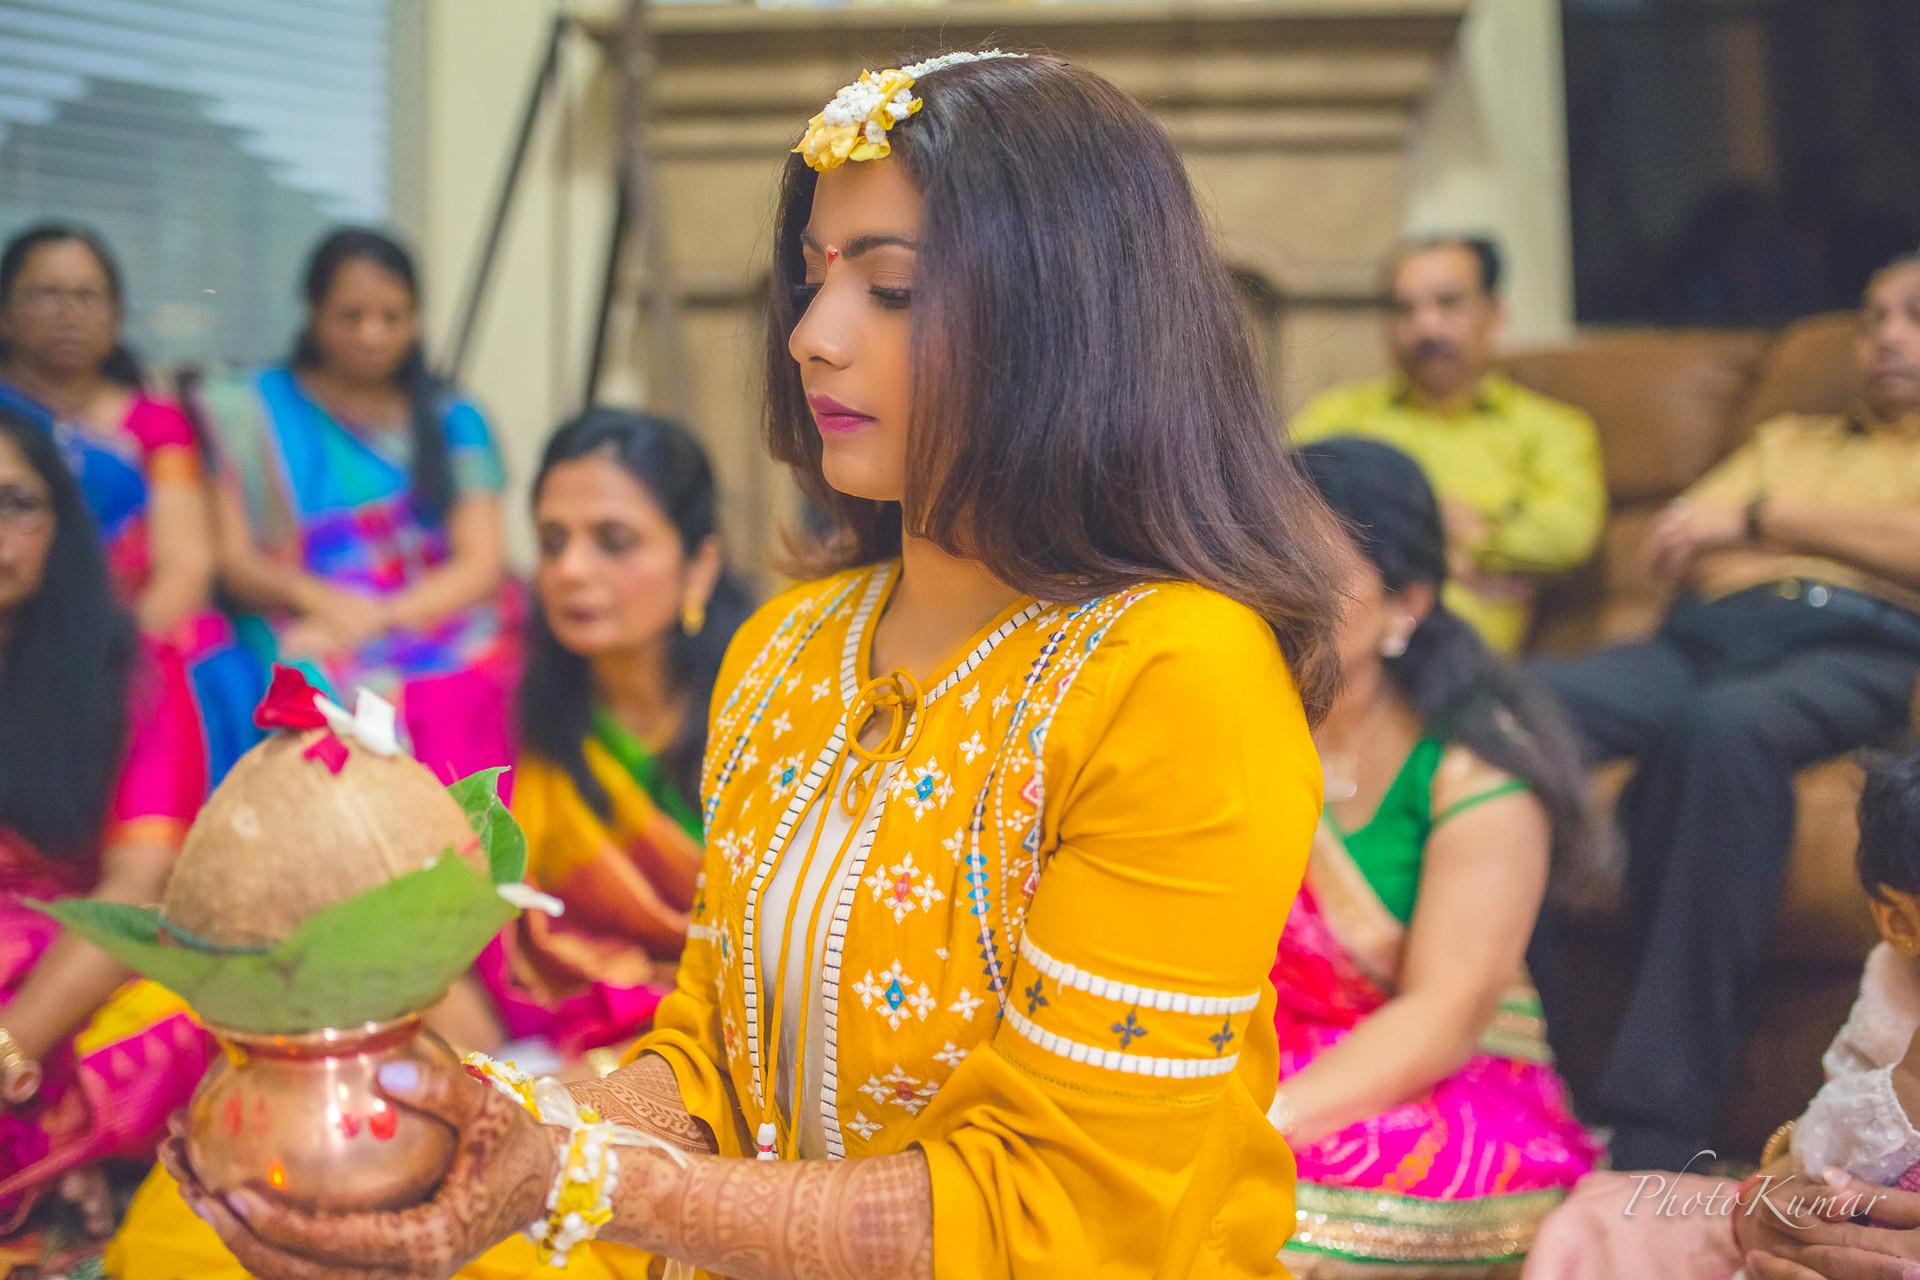 PhotoKumar-Nilam-Pre-wedding-irving-dallas-texas-14.jpg